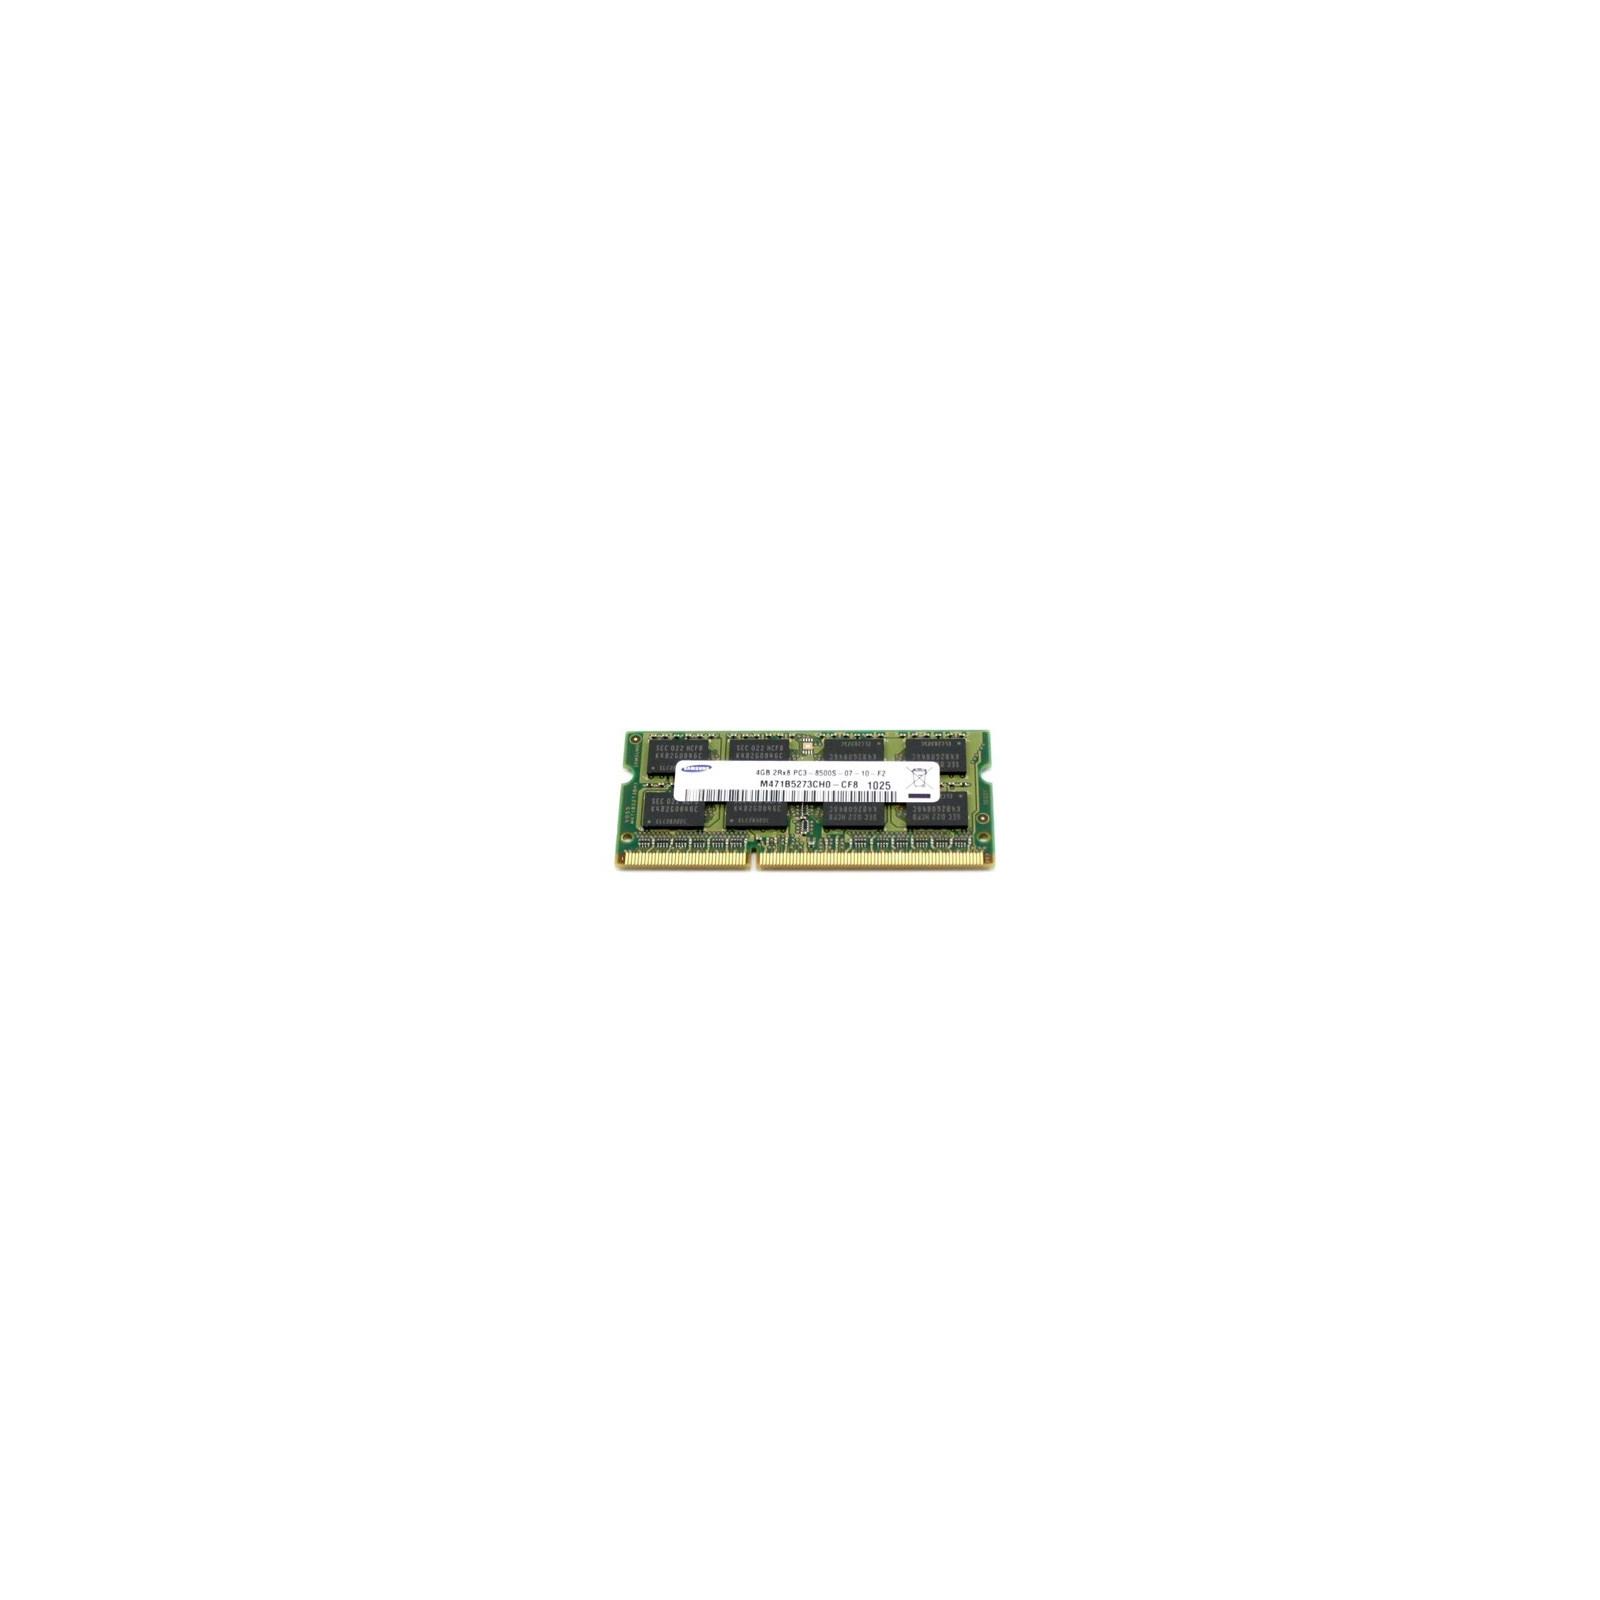 Модуль памяти для ноутбука SoDIMM DDR3 4GB 1066 MHz Samsung (Original)